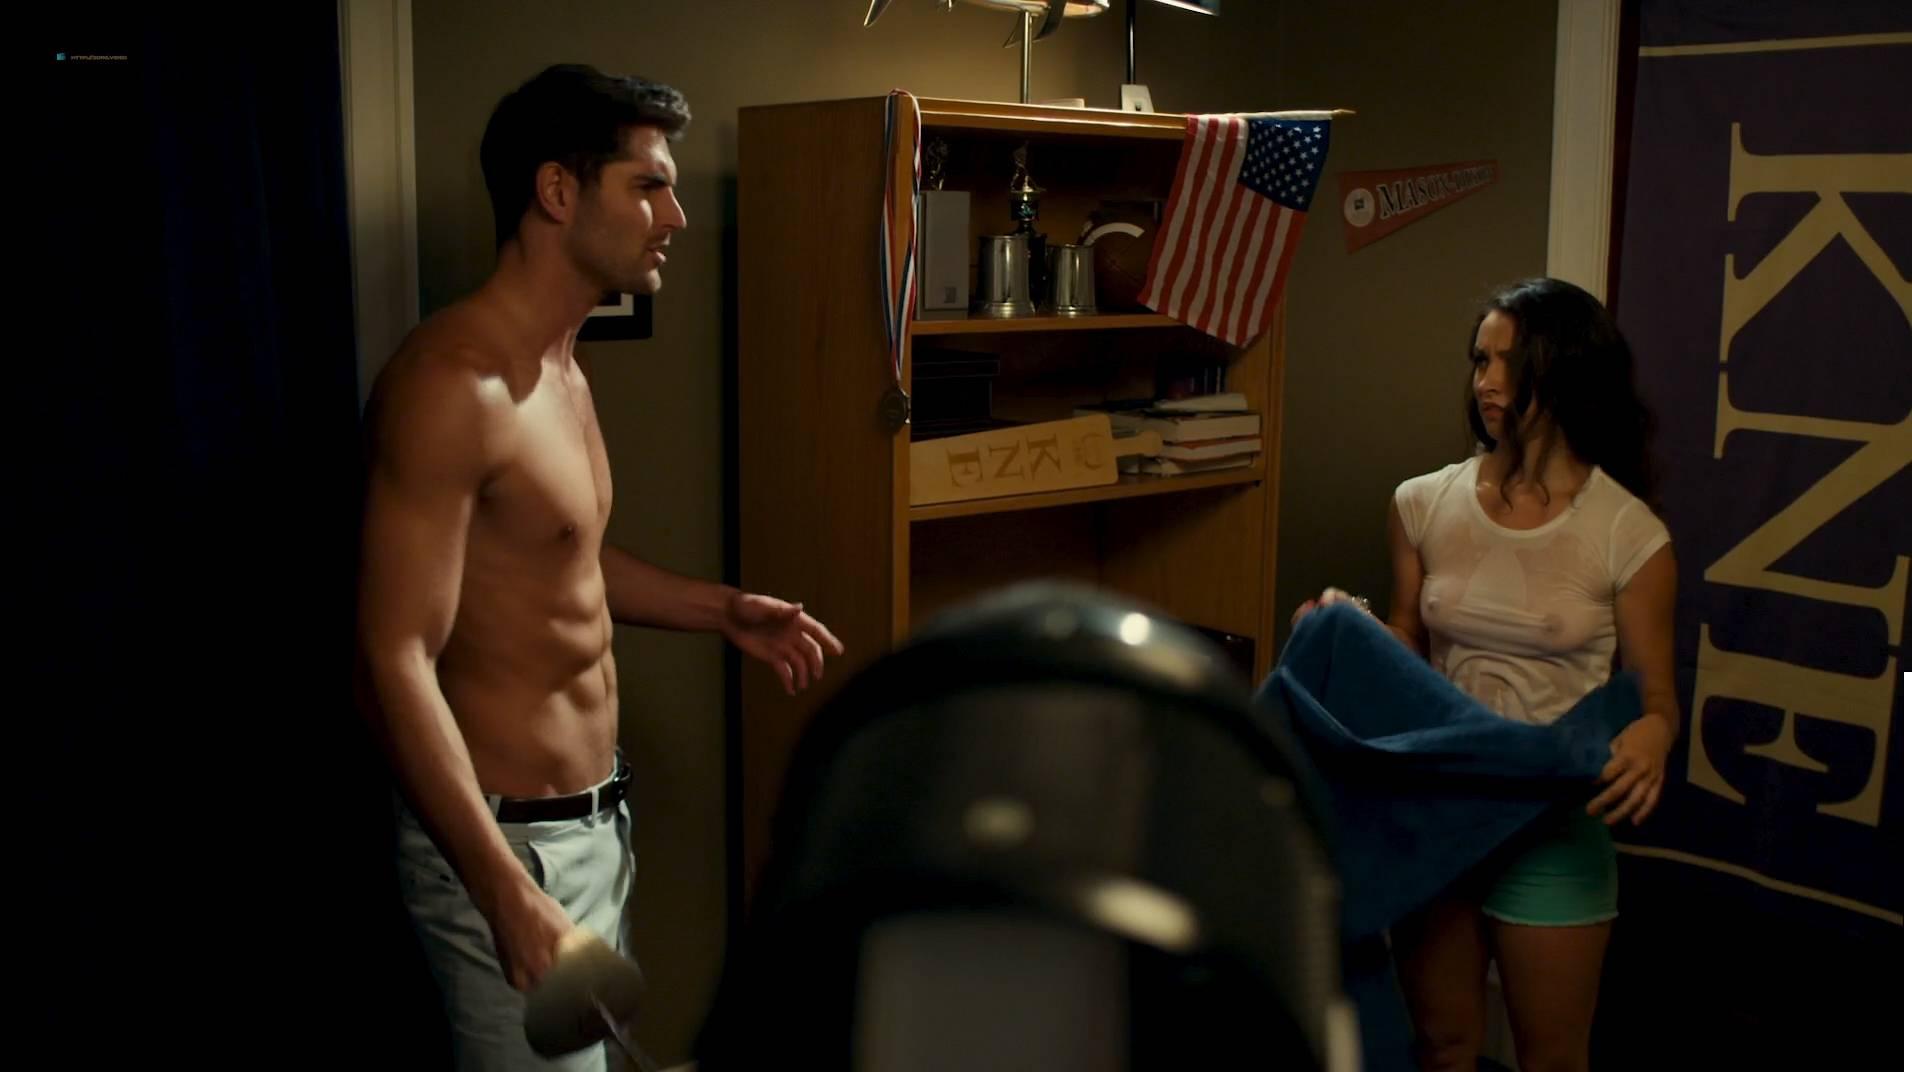 Jennifer Krukowski nude topless Aubrey Ferron and others all nude - Total Frat Movie (2016.) HD 1080p WEB (15)